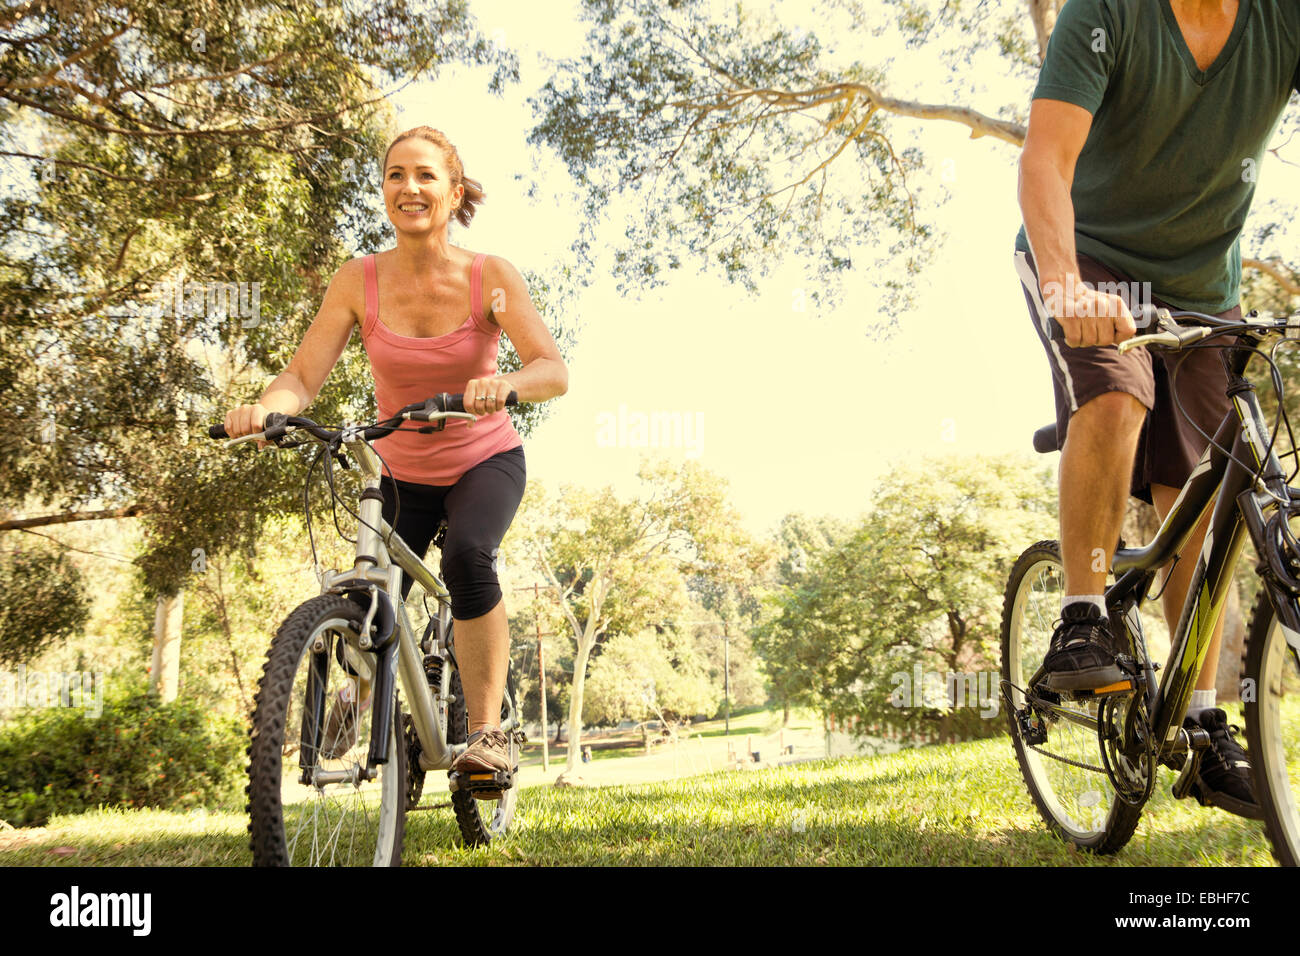 Mature couple cycling through park - Stock Image